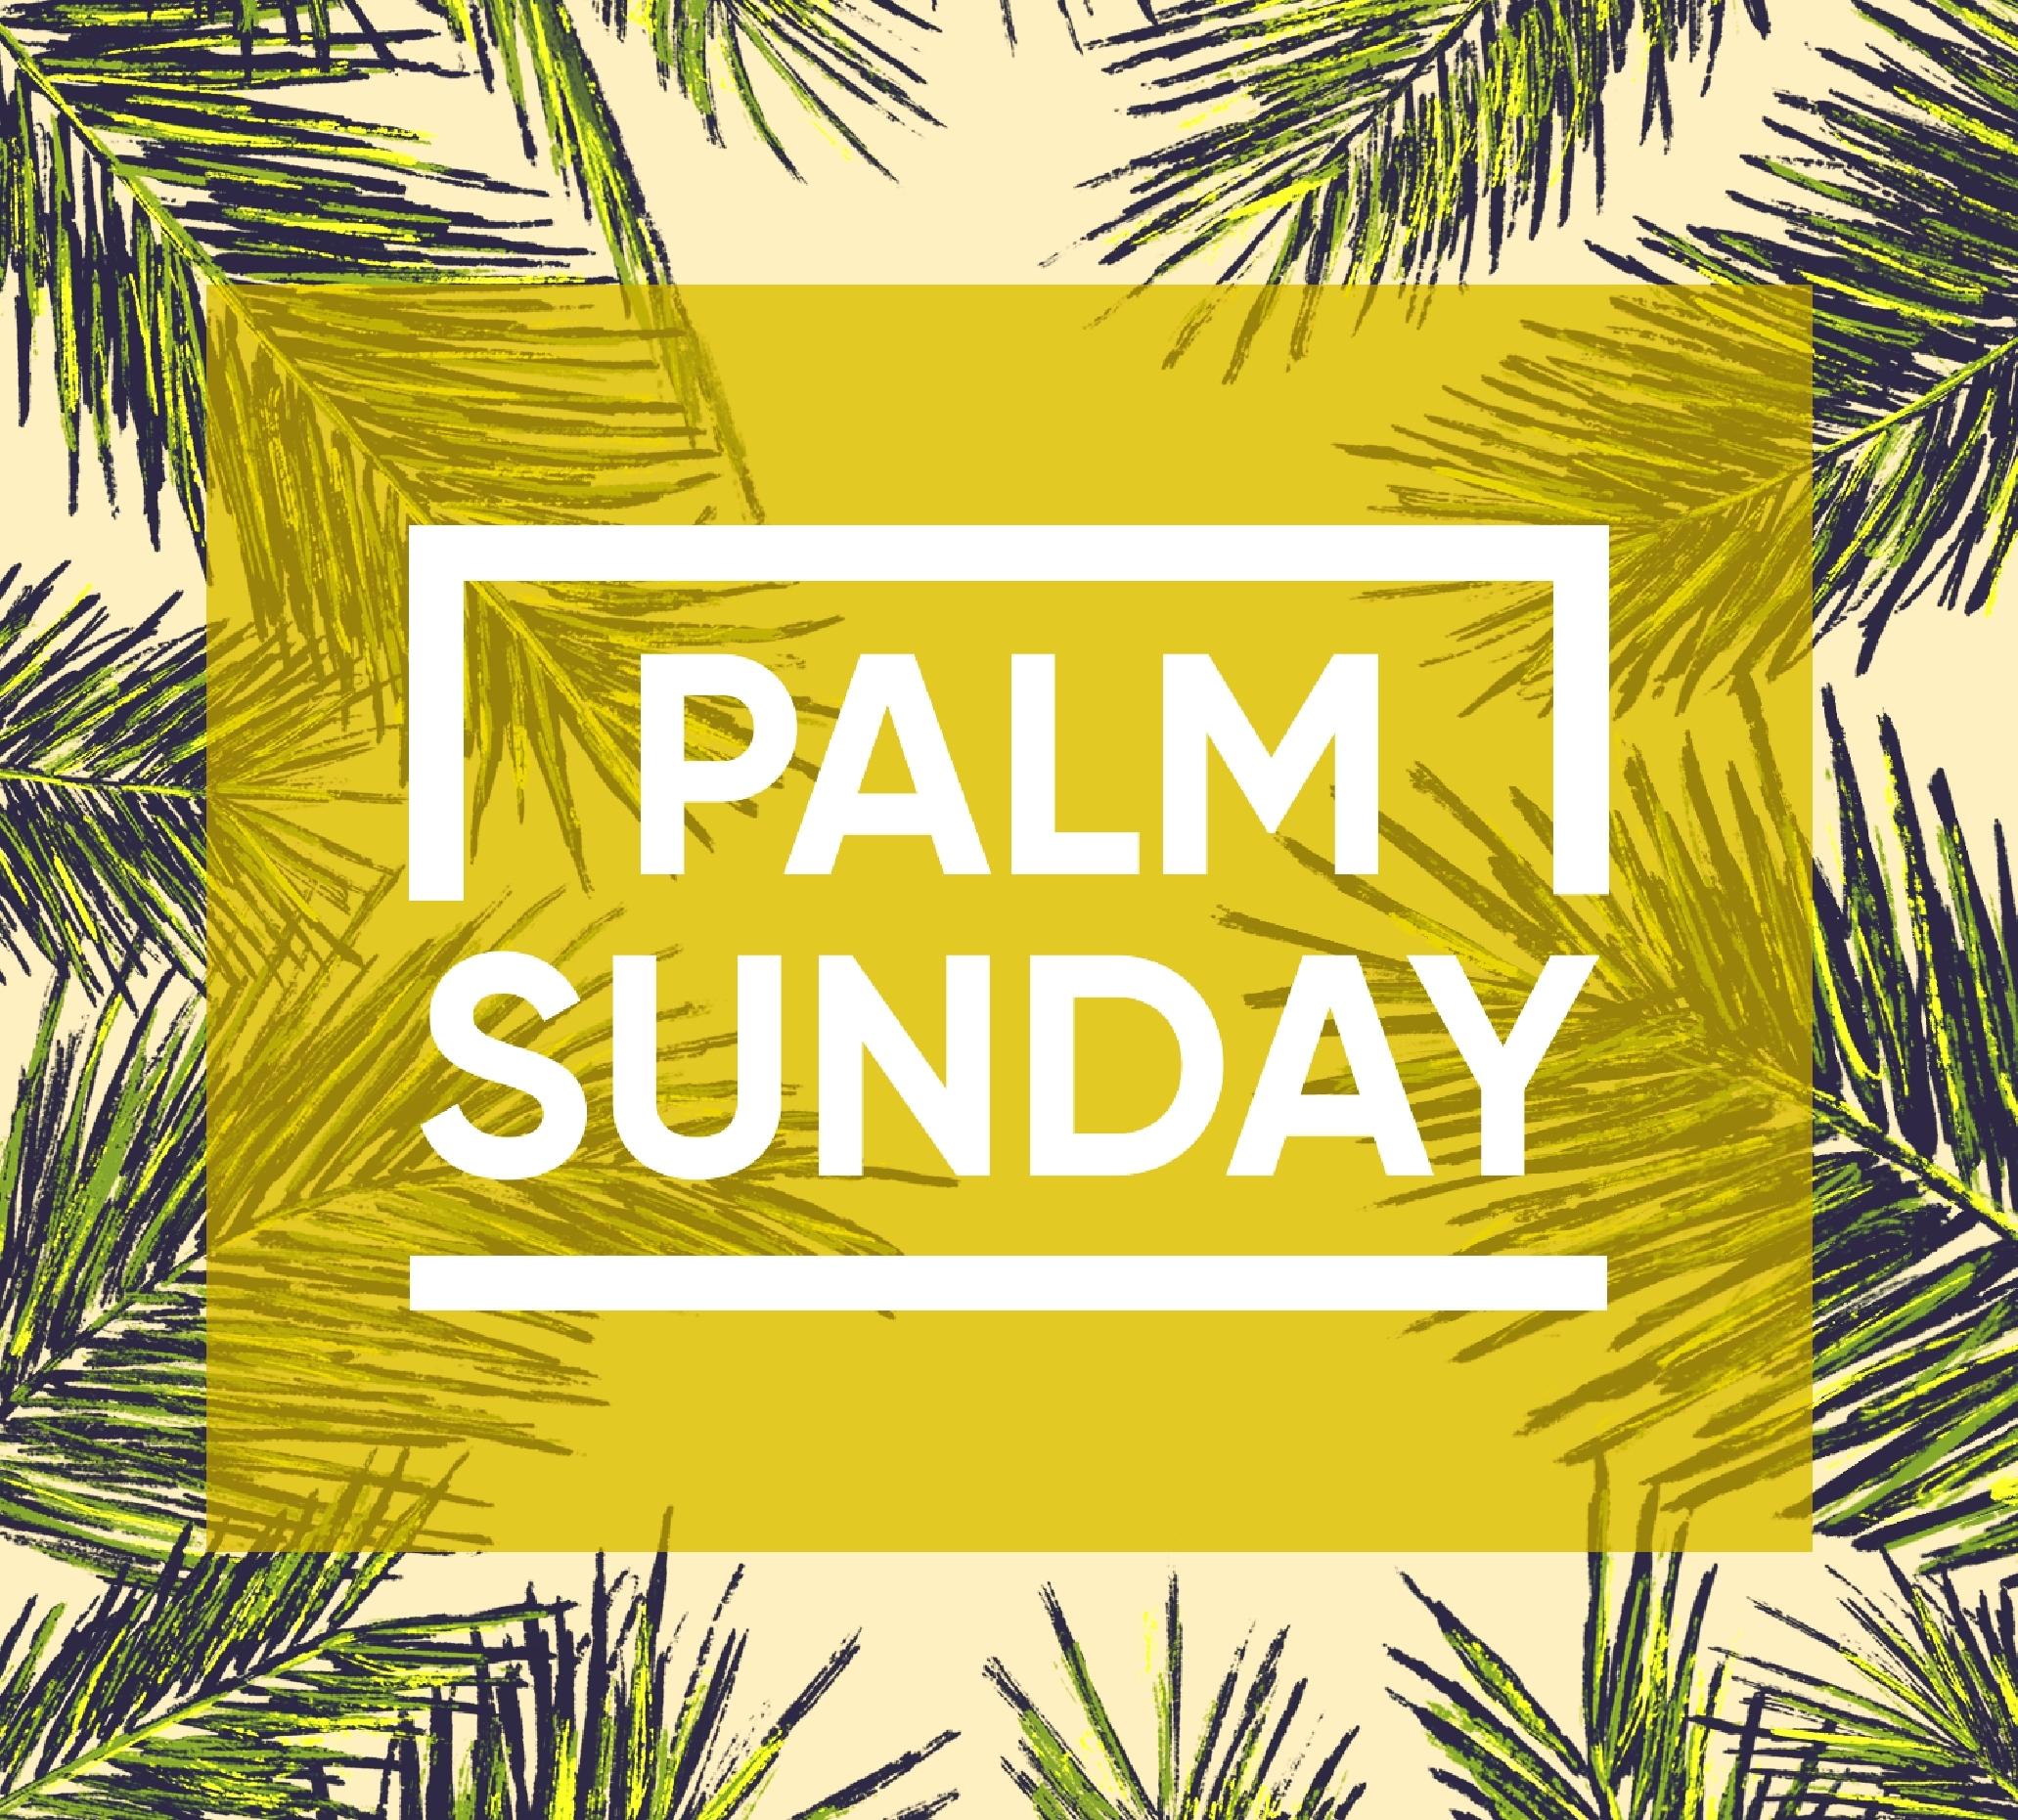 Palm-Sunday-Church-Bulletin.jpg